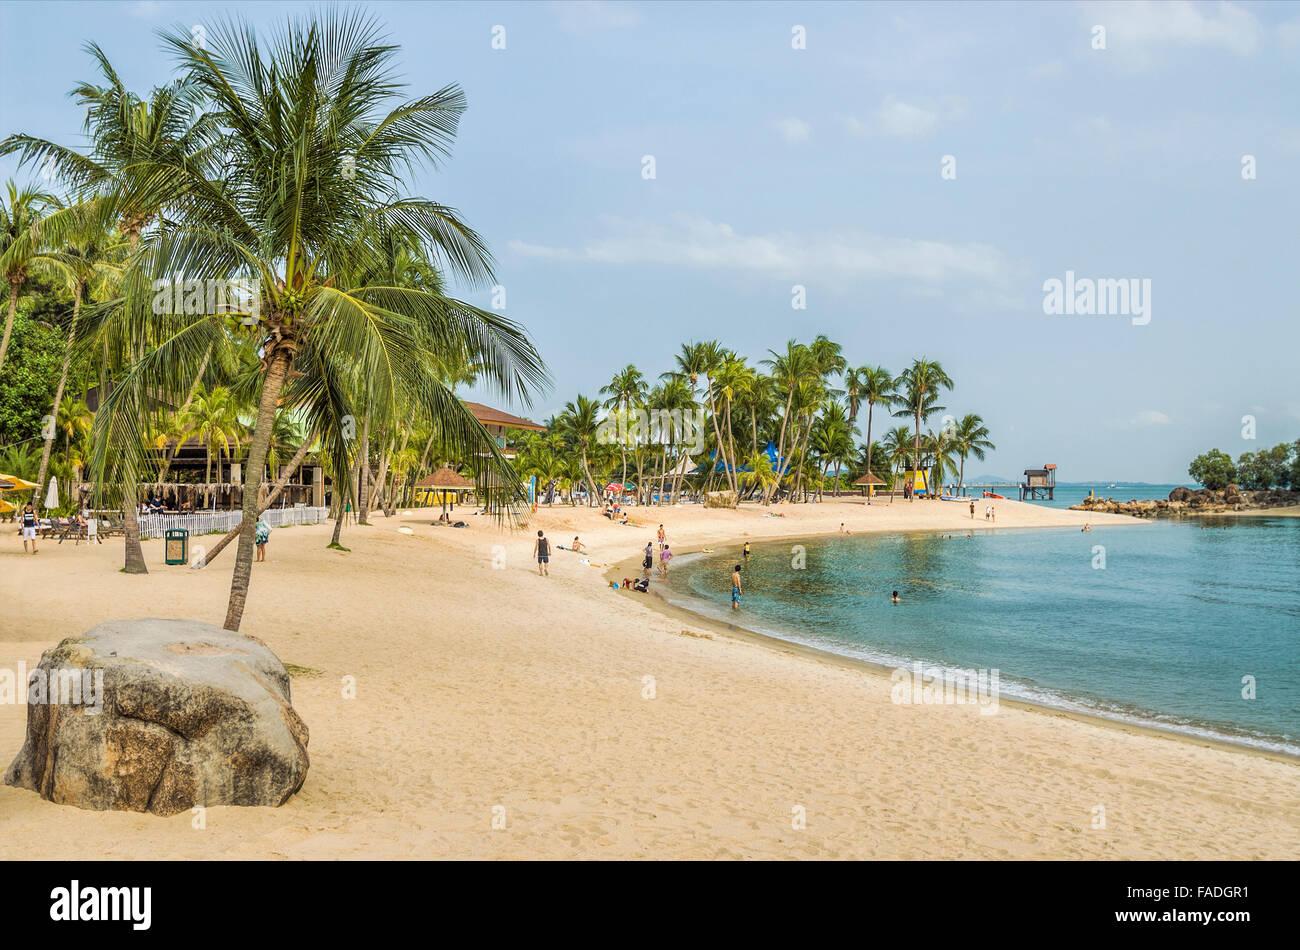 Siloso Beach on Sentosa Island, Singapore   Siloso Beach auf der Insel Sentosa, Singapur - Stock Image